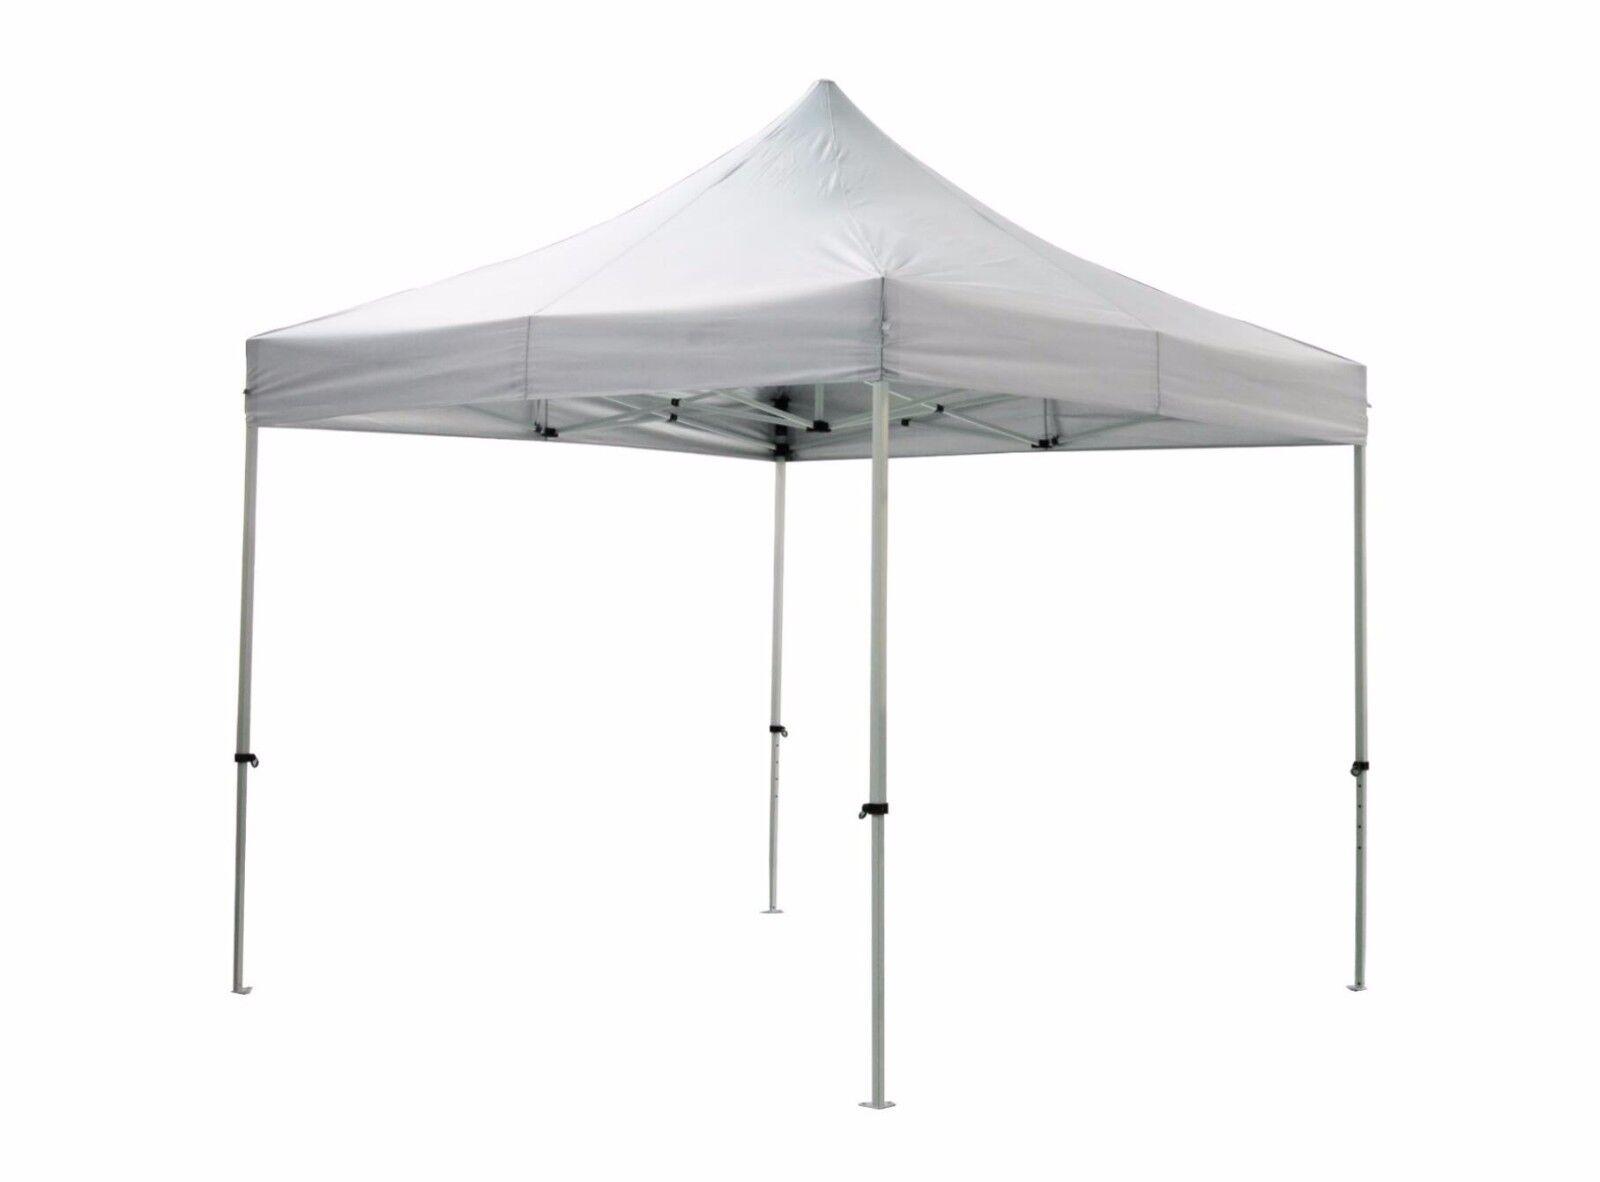 GREADEN-Tente Pliante Blanche Tonnelle Pliable 3x3m PREMIUM LIGHT Pavillon Jardi